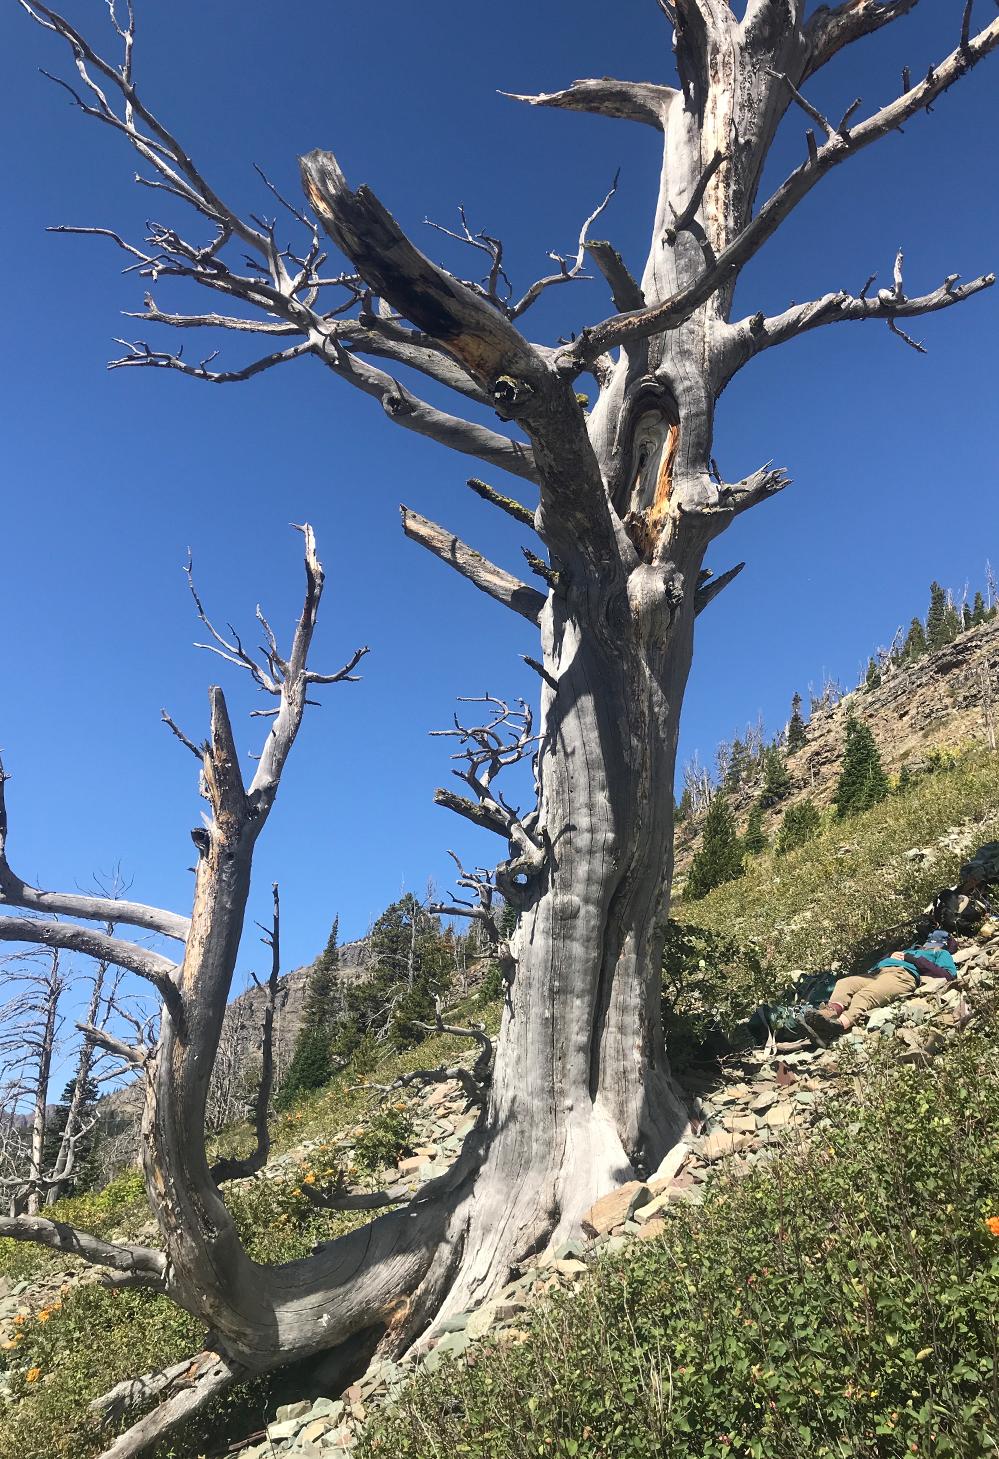 A researcher naps under a dead whitebark pine tree amidst an alpine landscape in Glacier National Park.